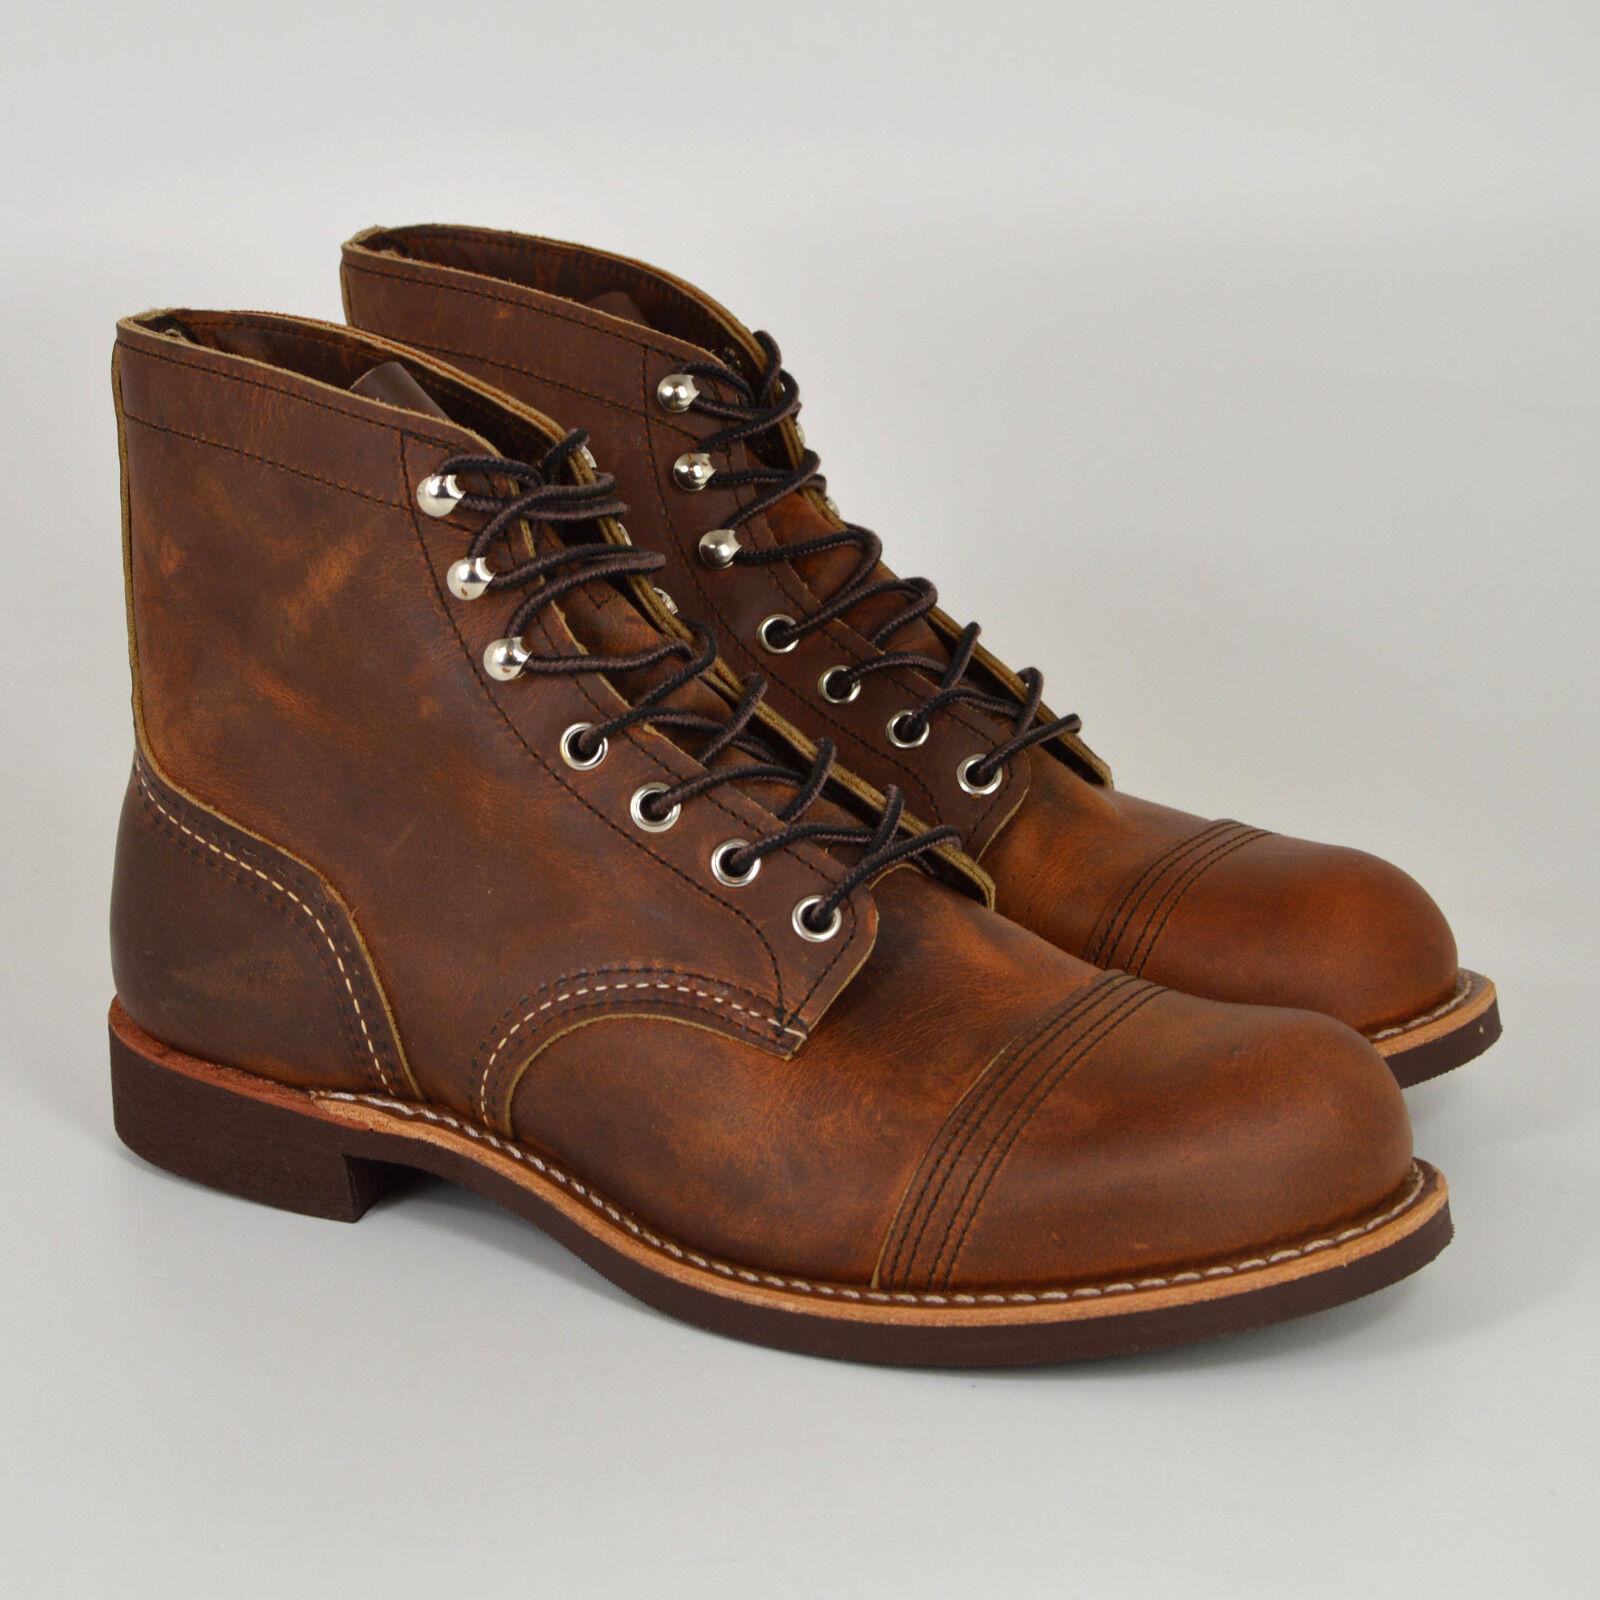 Red Wing Shoes 8085, Iron Ranger Boots, Copper Rough & Tough, Braun, Leder, Neu